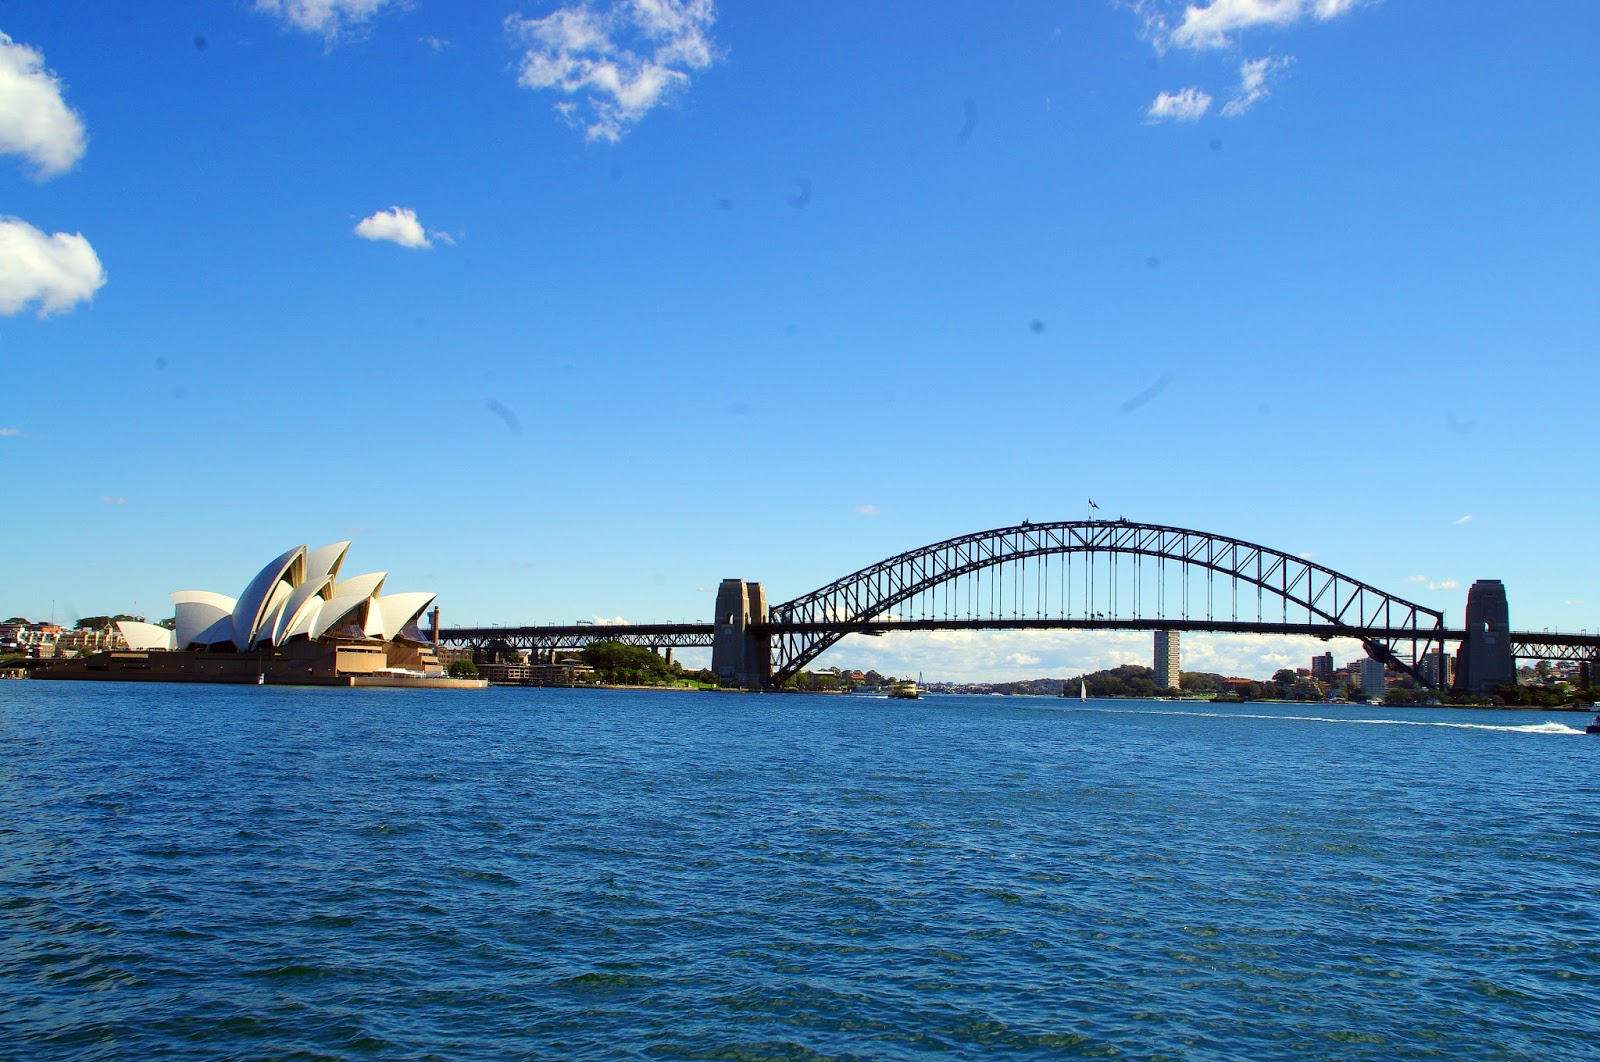 The opera house and harbour bridge